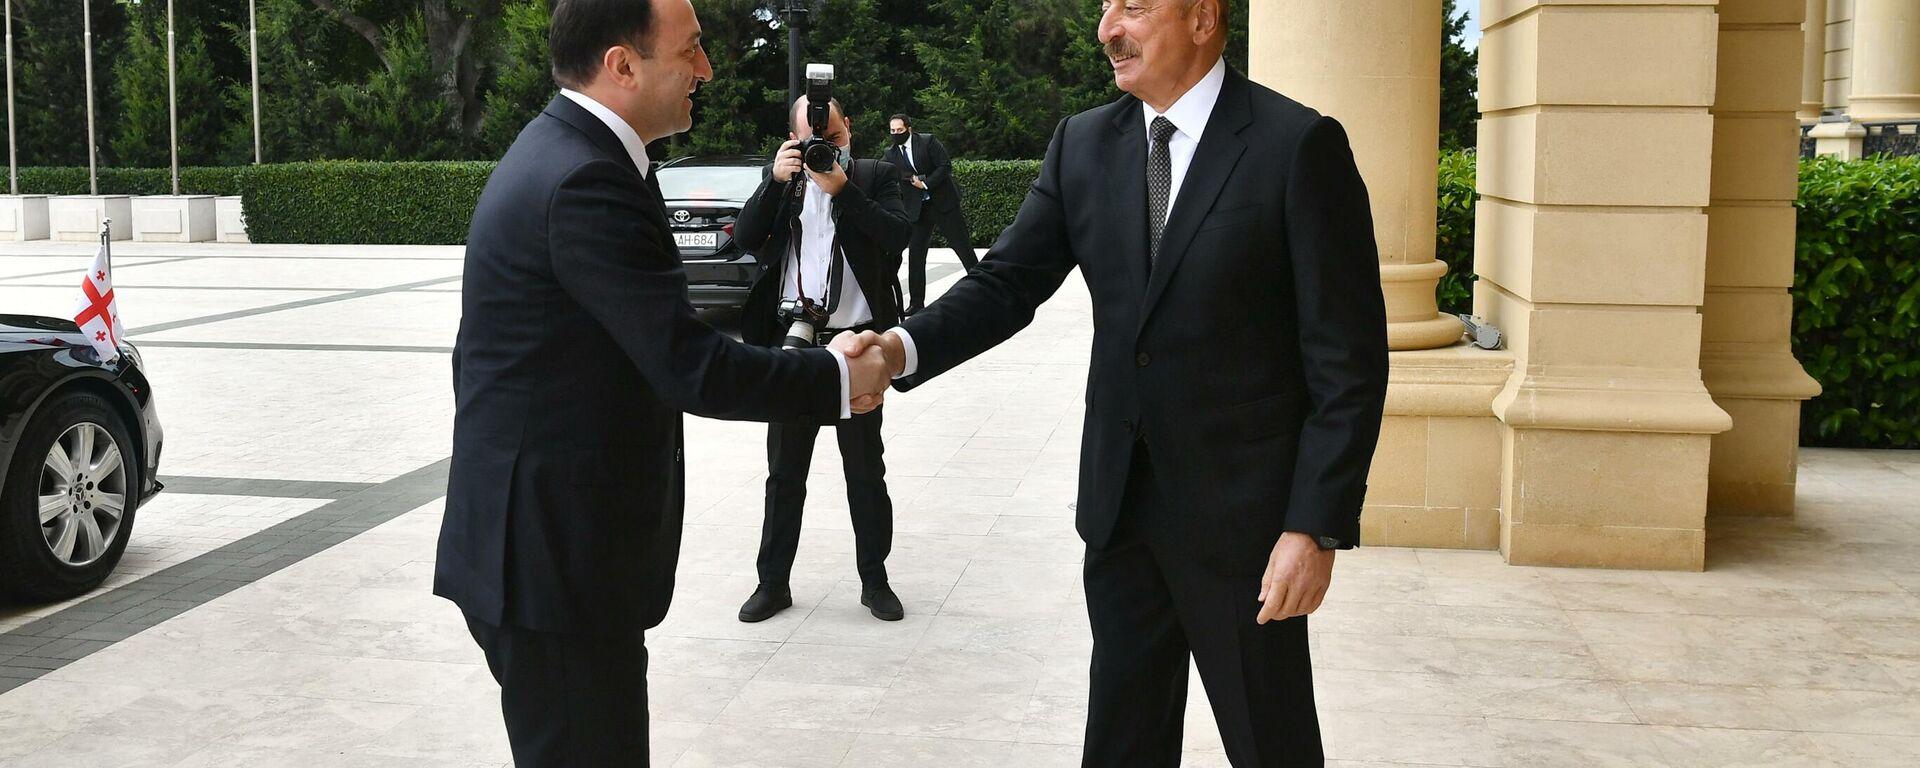 Президент Азербайджана Ильхам Алиев и премьер-министр Грузии Ираклий Гарибашвили - Sputnik Азербайджан, 1920, 29.09.2021